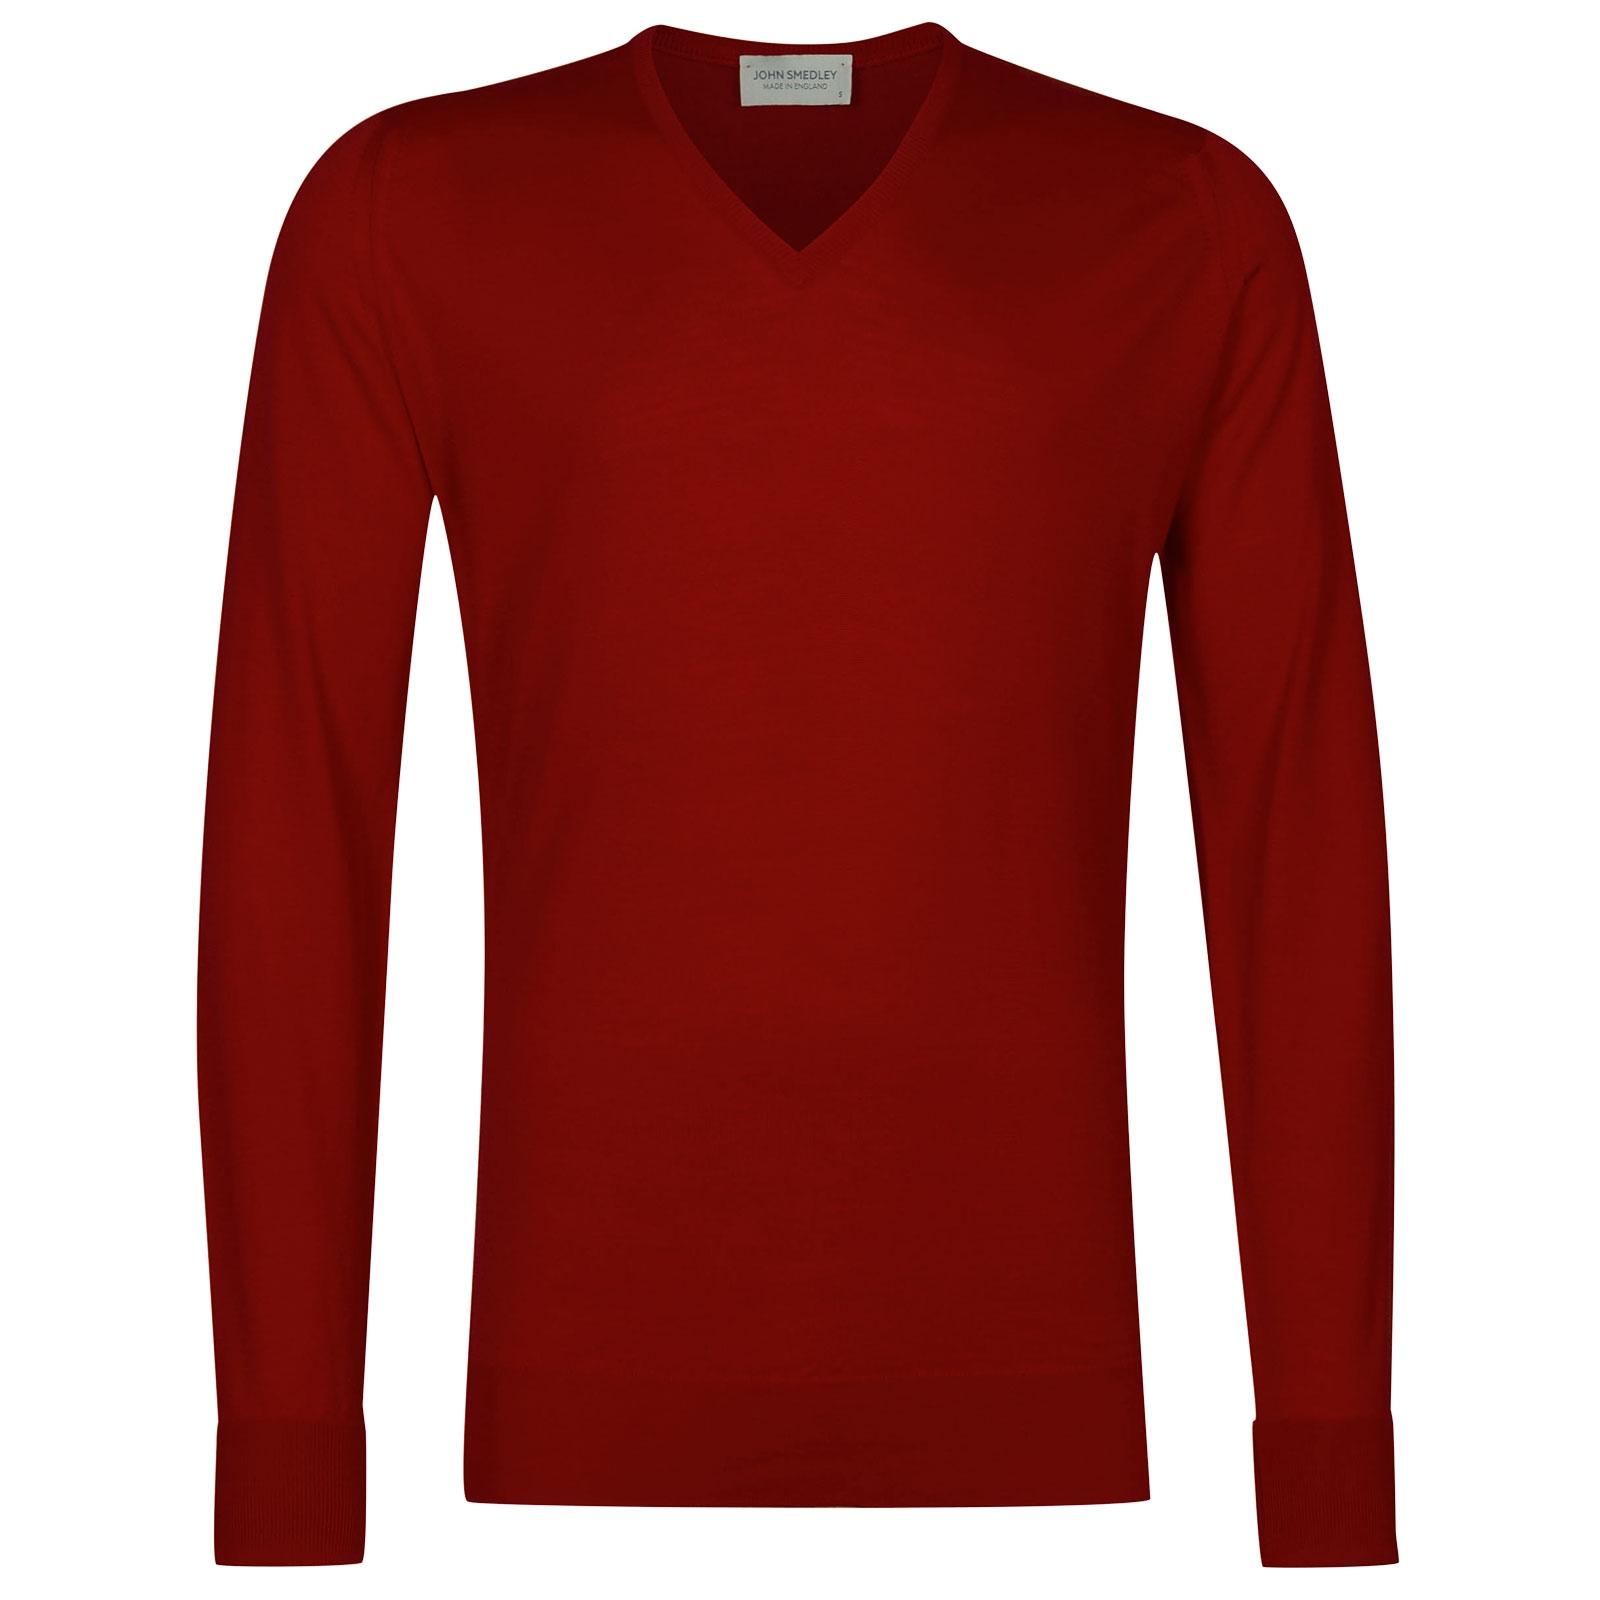 John Smedley Bobby Merino Wool Pullover in Dandy Red-XL